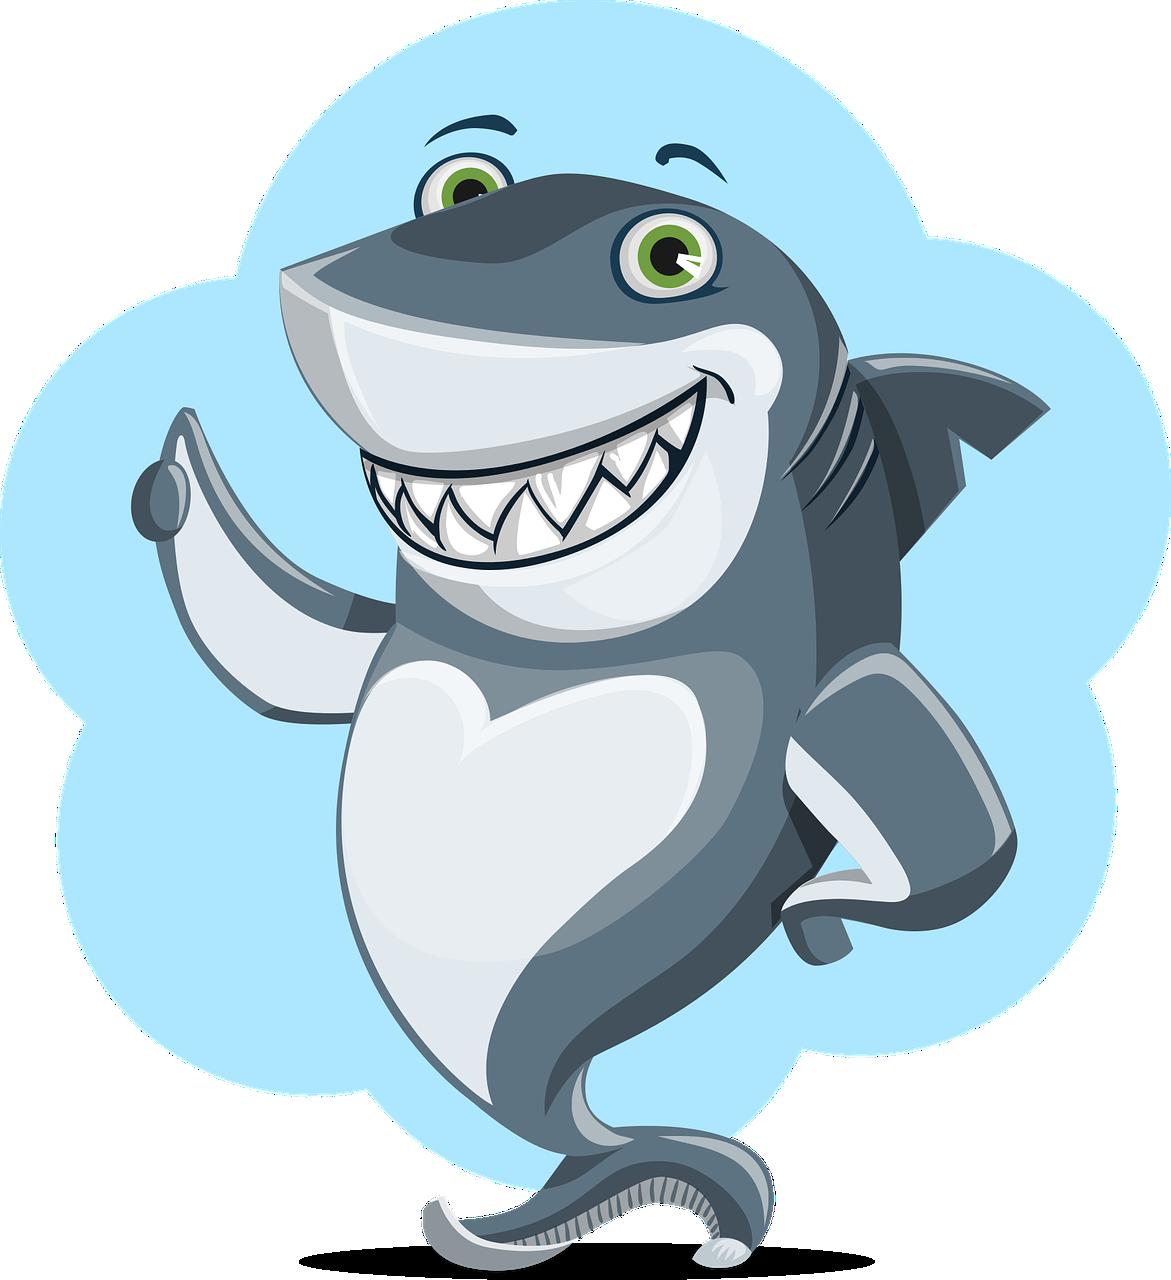 Shark Animal Character - Free vector graphic on Pixabay